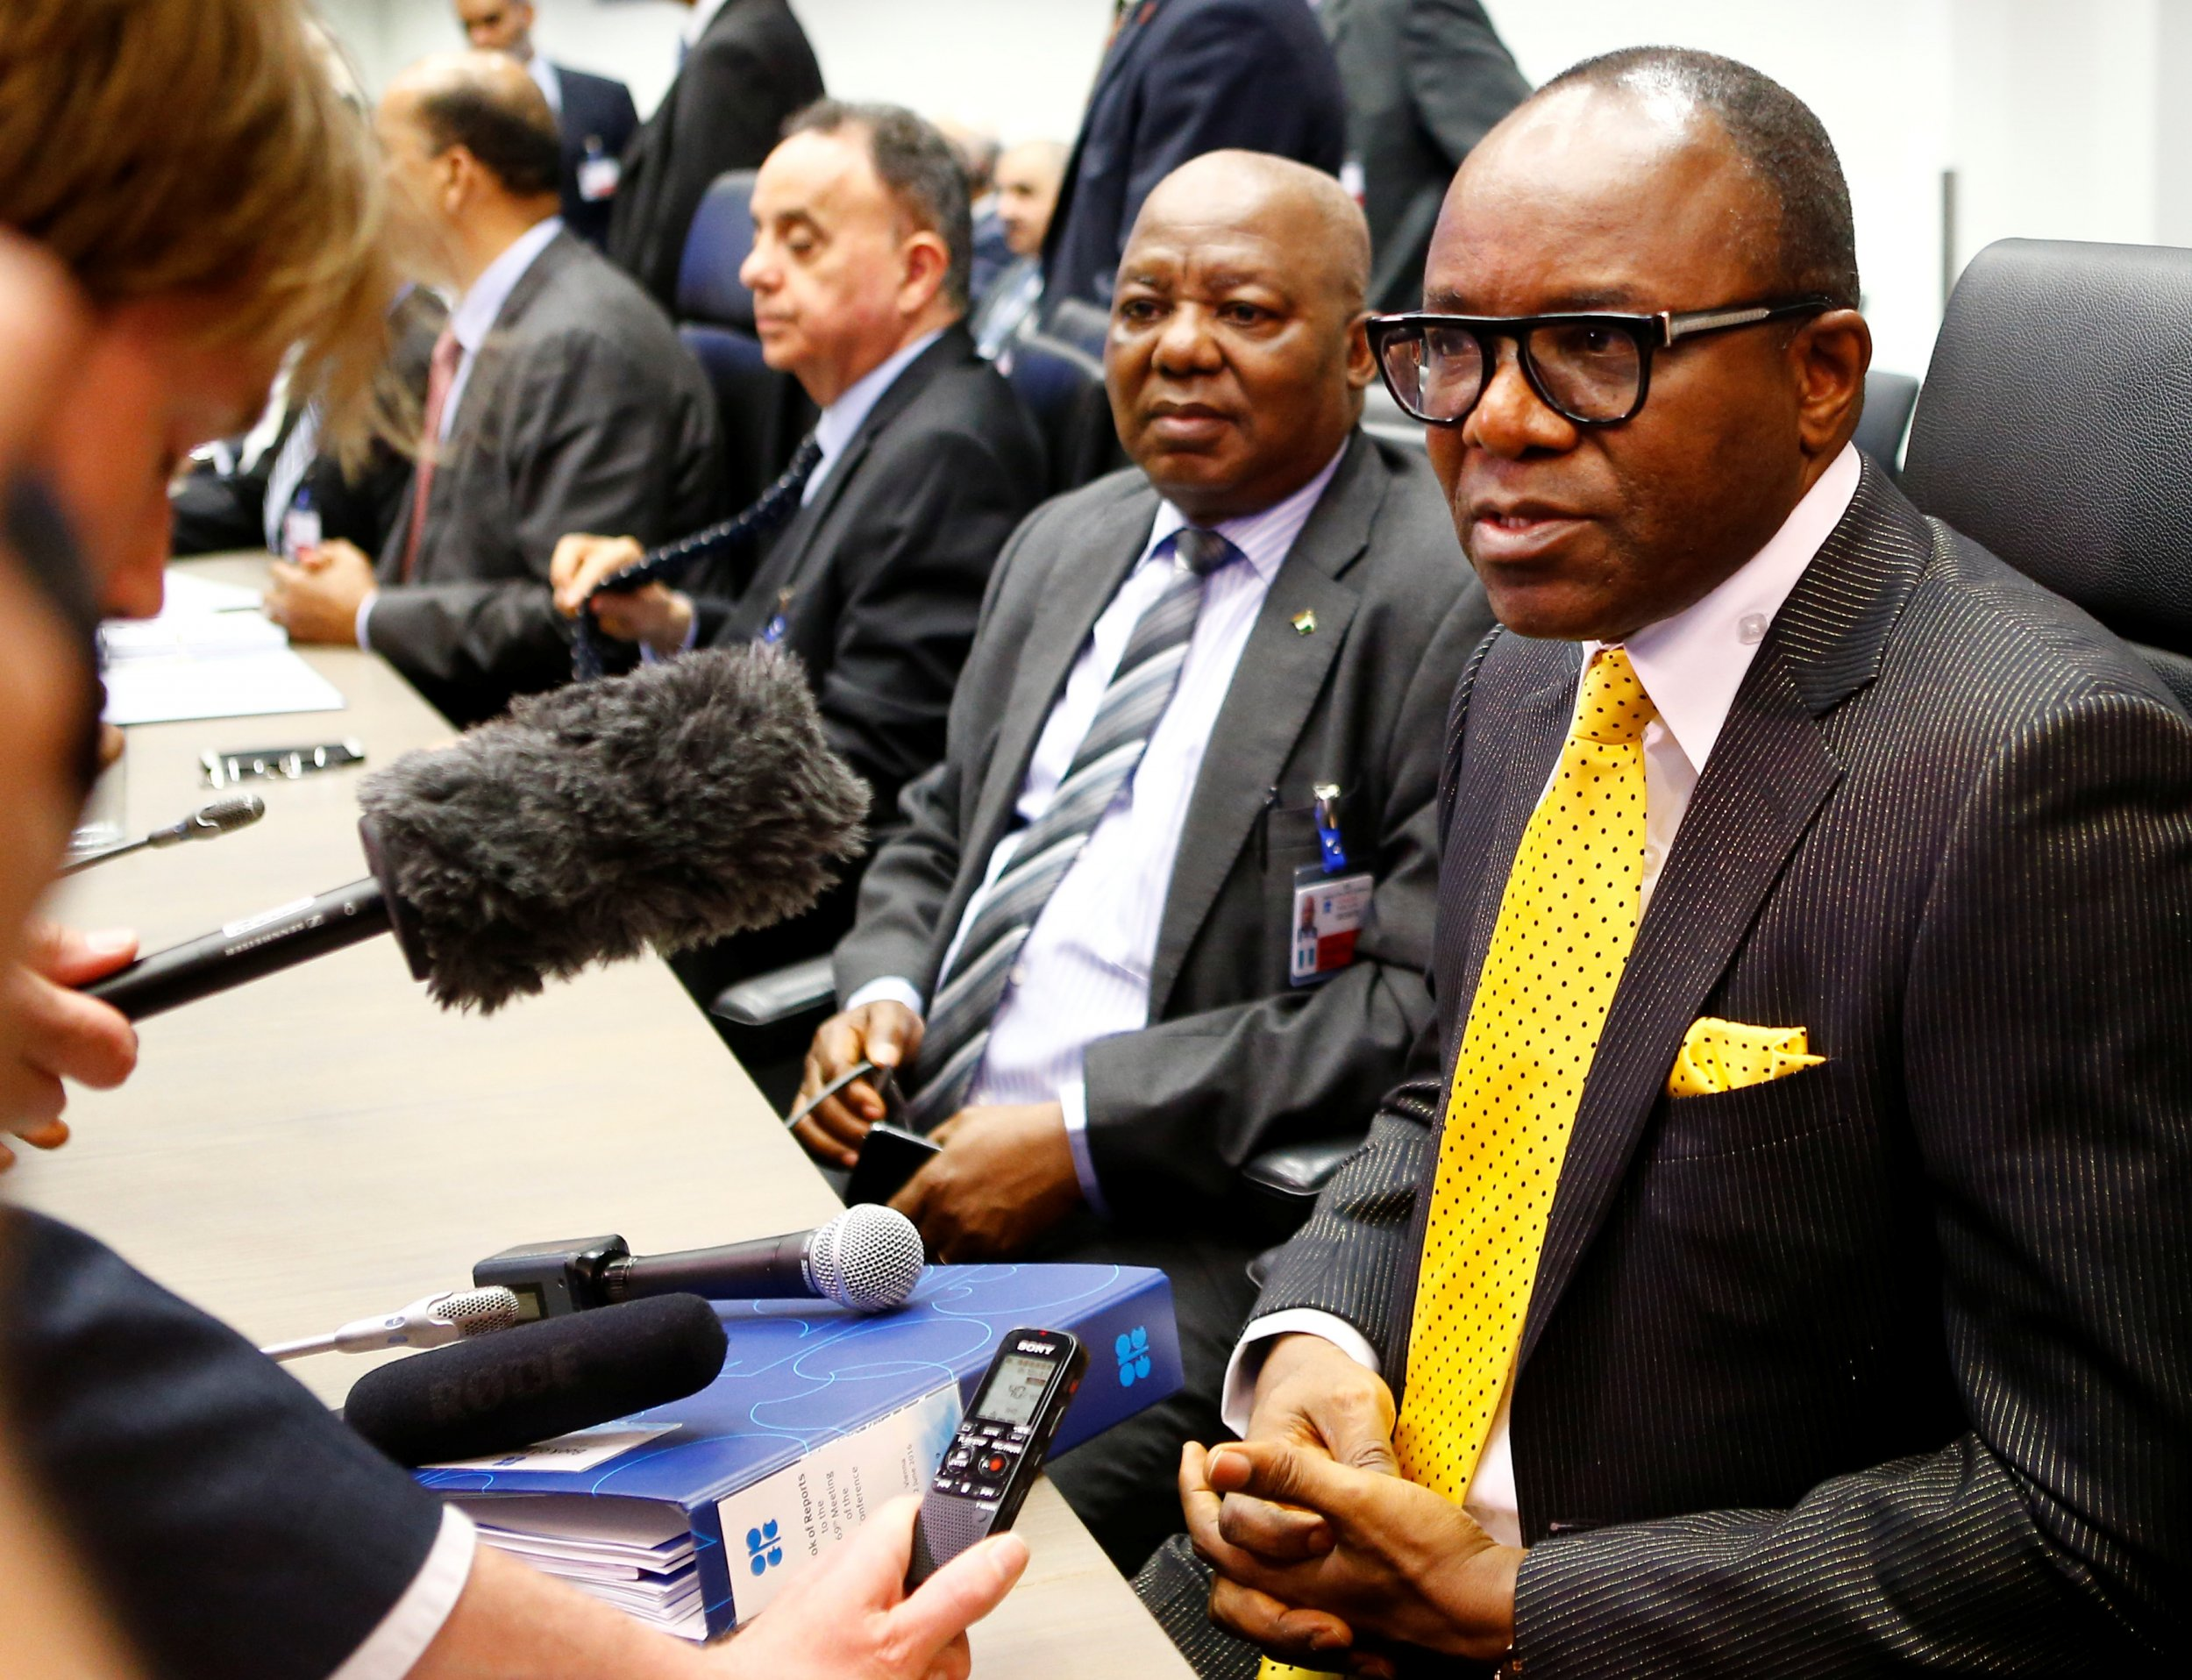 Nigerian oil minister Emmanuel Ibe Kachikwu